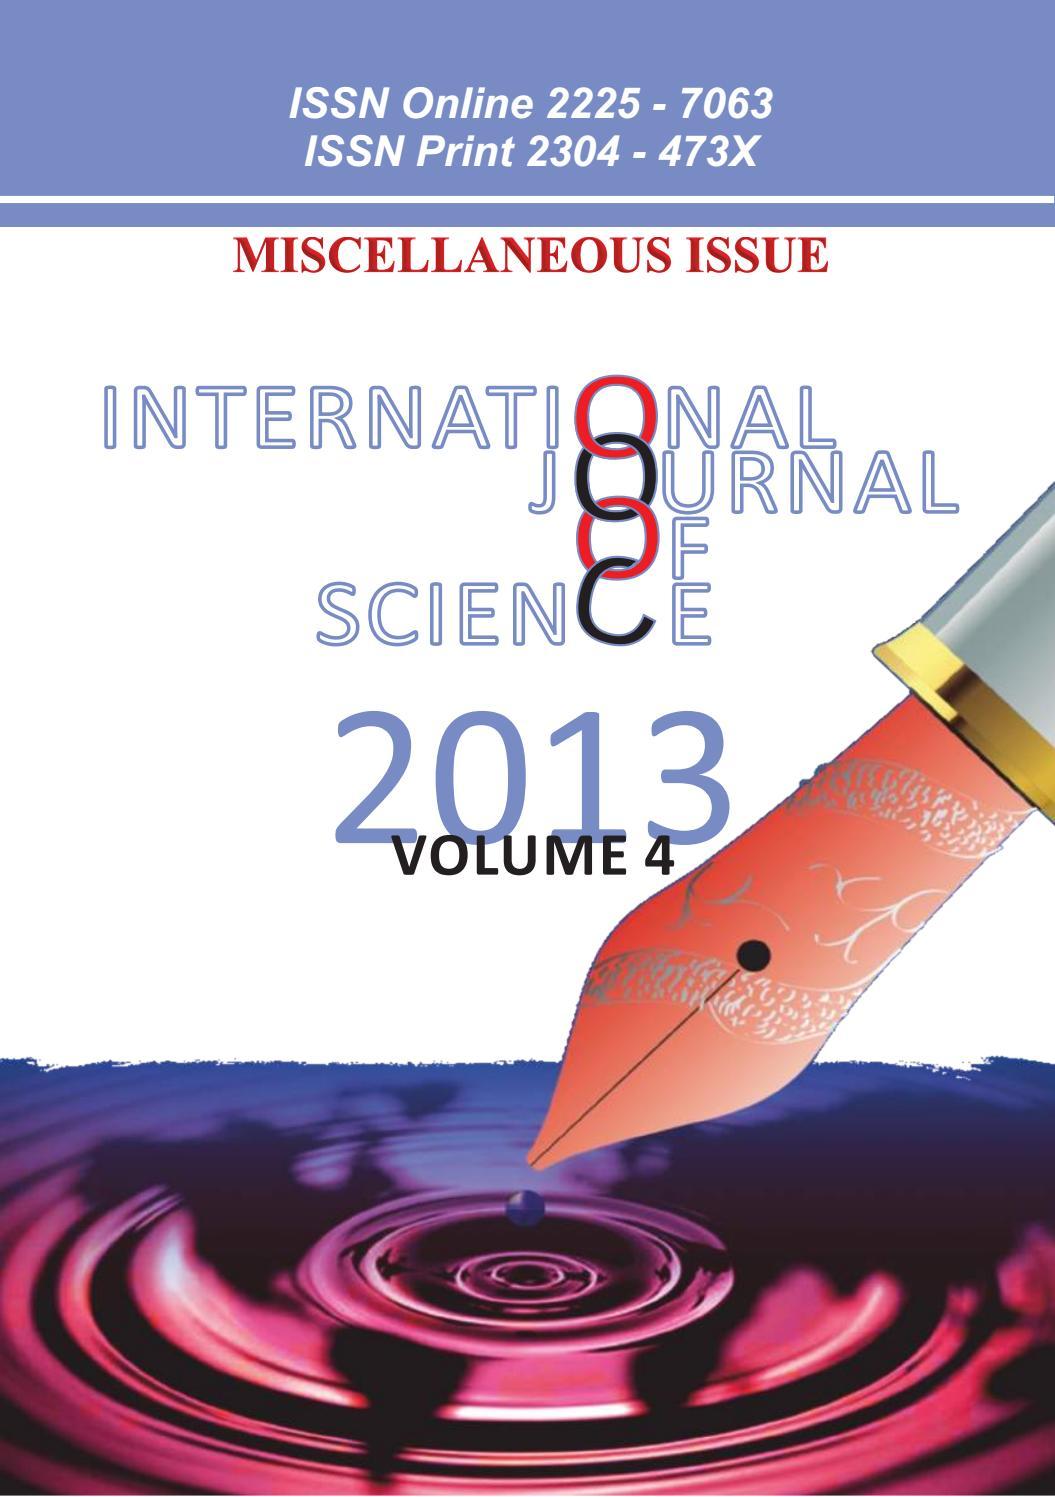 Ijosc Volume 4 By Science Journal Issuu